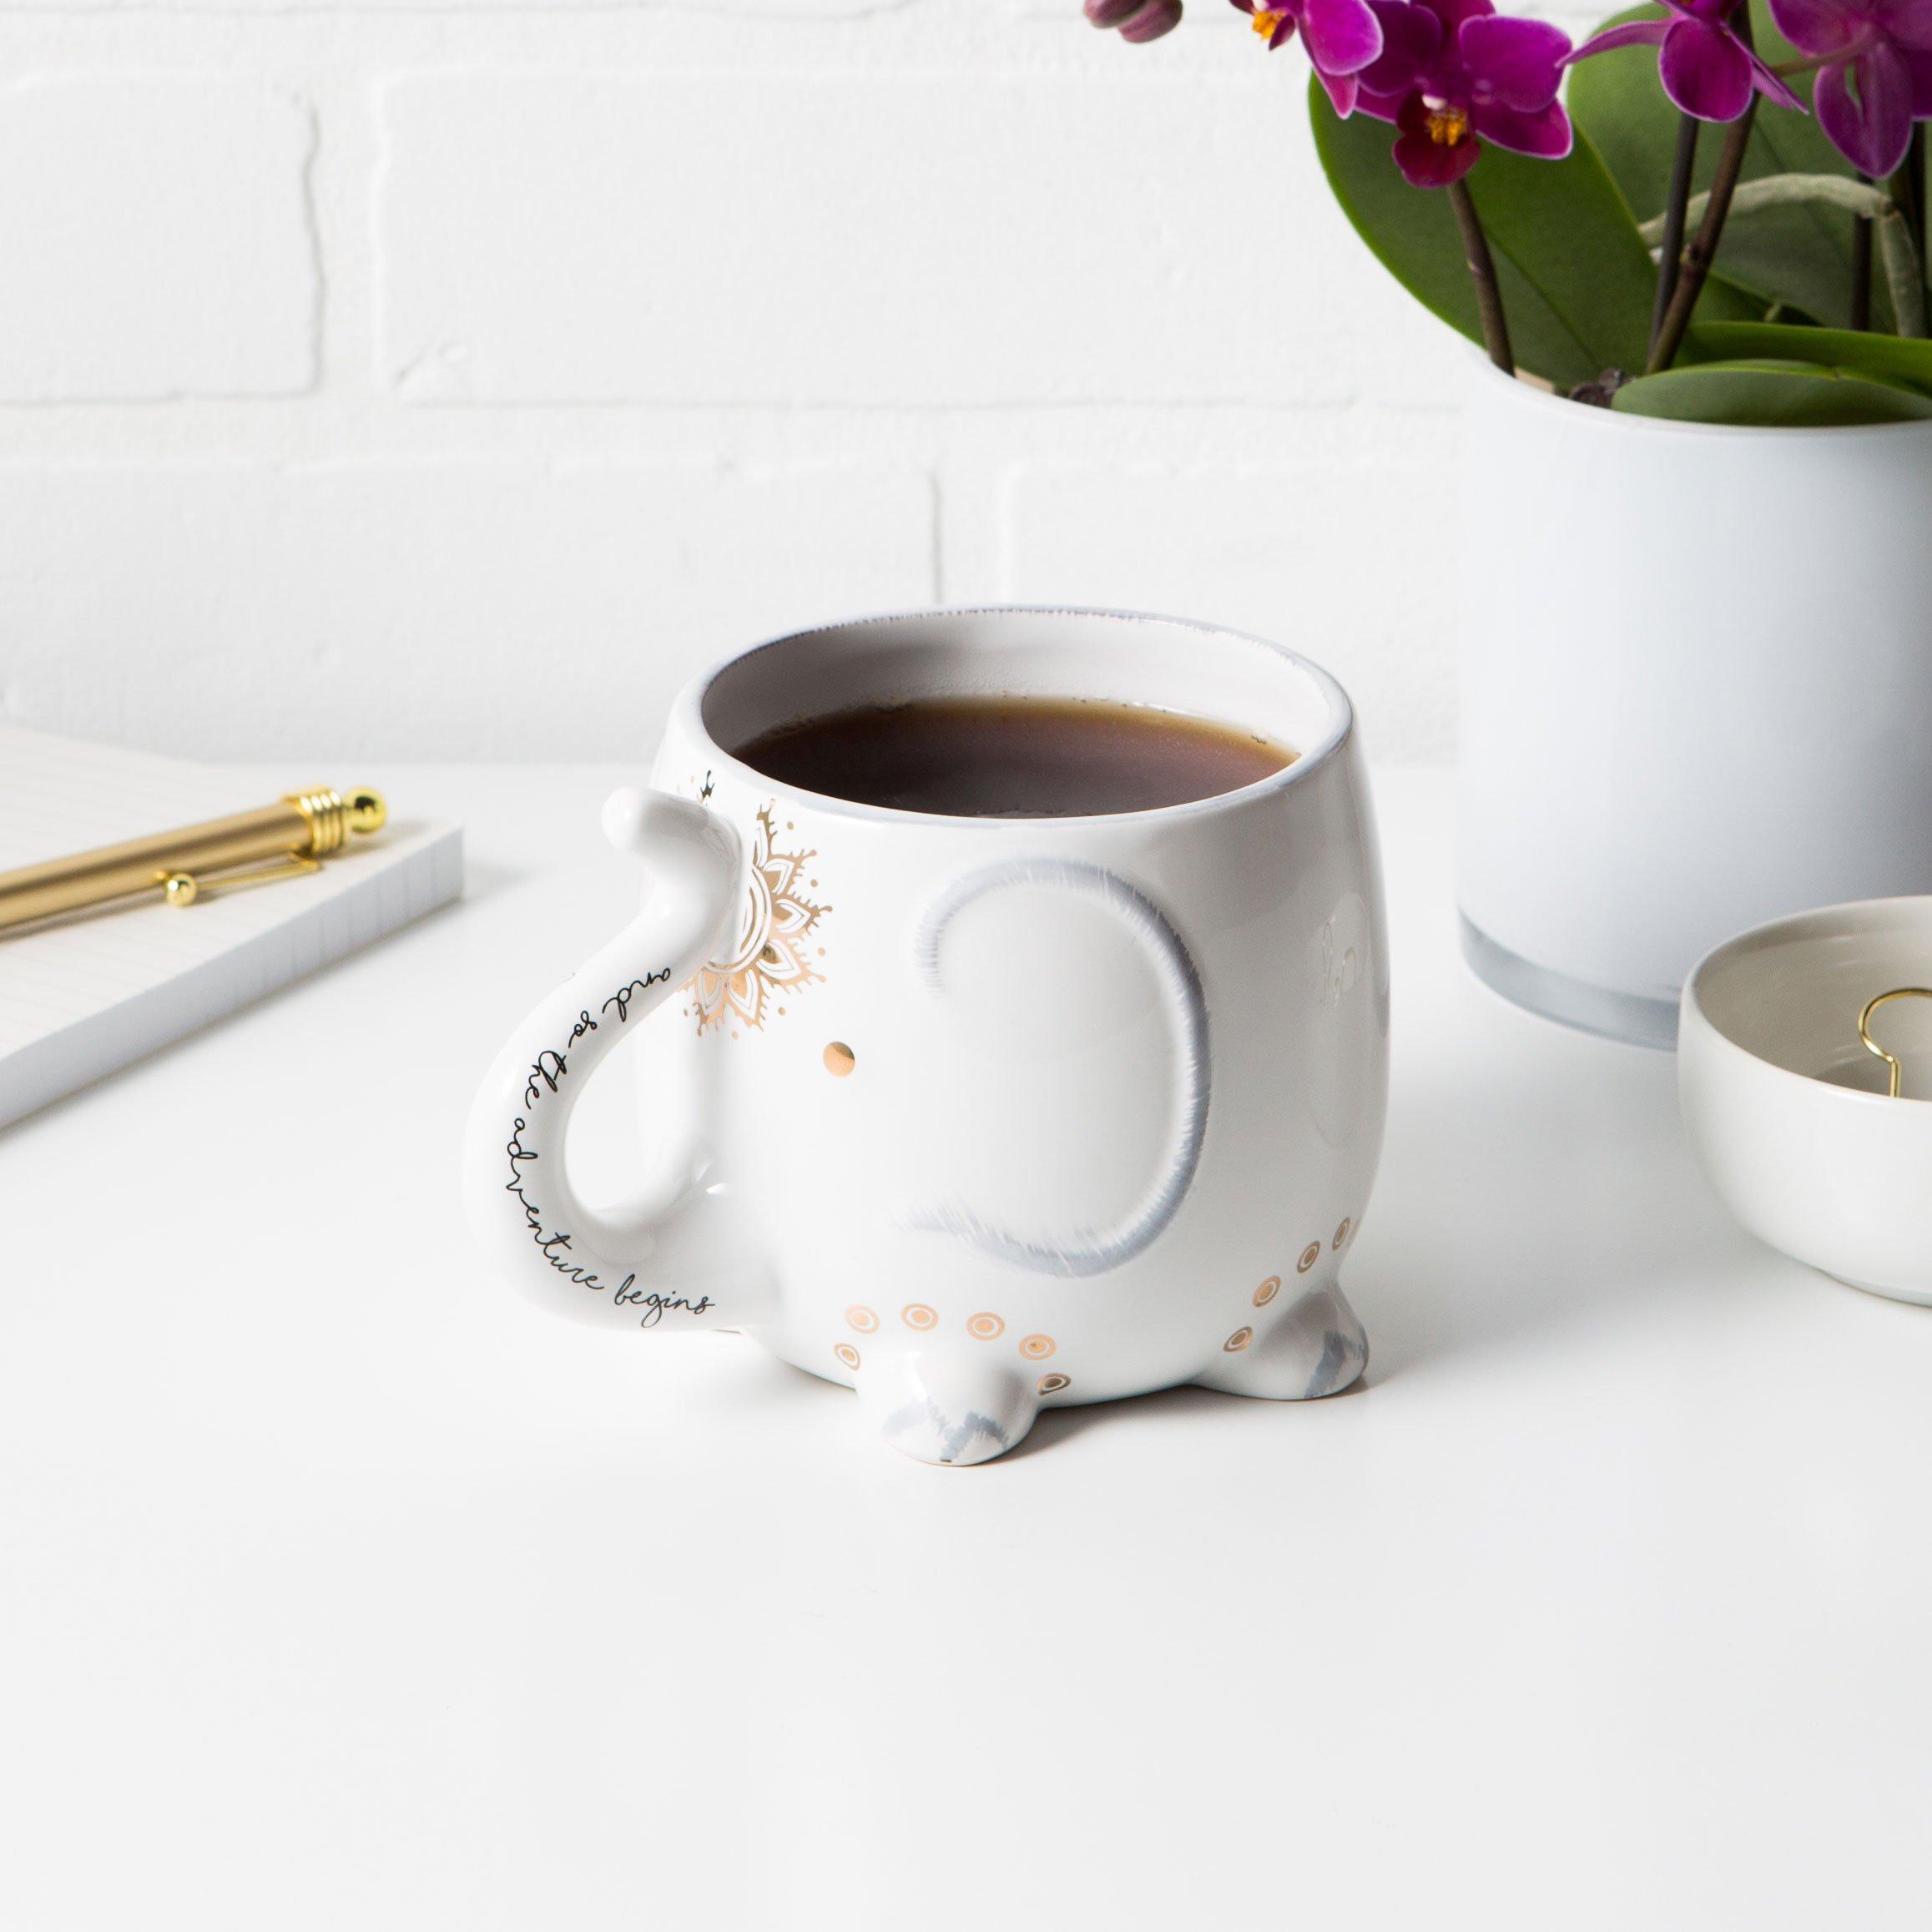 White Ceramic Coffee or Tea Mugs: Tri-Coastal Design Soho Boho Elephant Coffee Mug with Gold Foil Details, Fun Trunk Handle and Printed Saying - 18.6 Fluid Ounce Large, Cute Handmade Cup by Tri-coastal Design (Image #4)